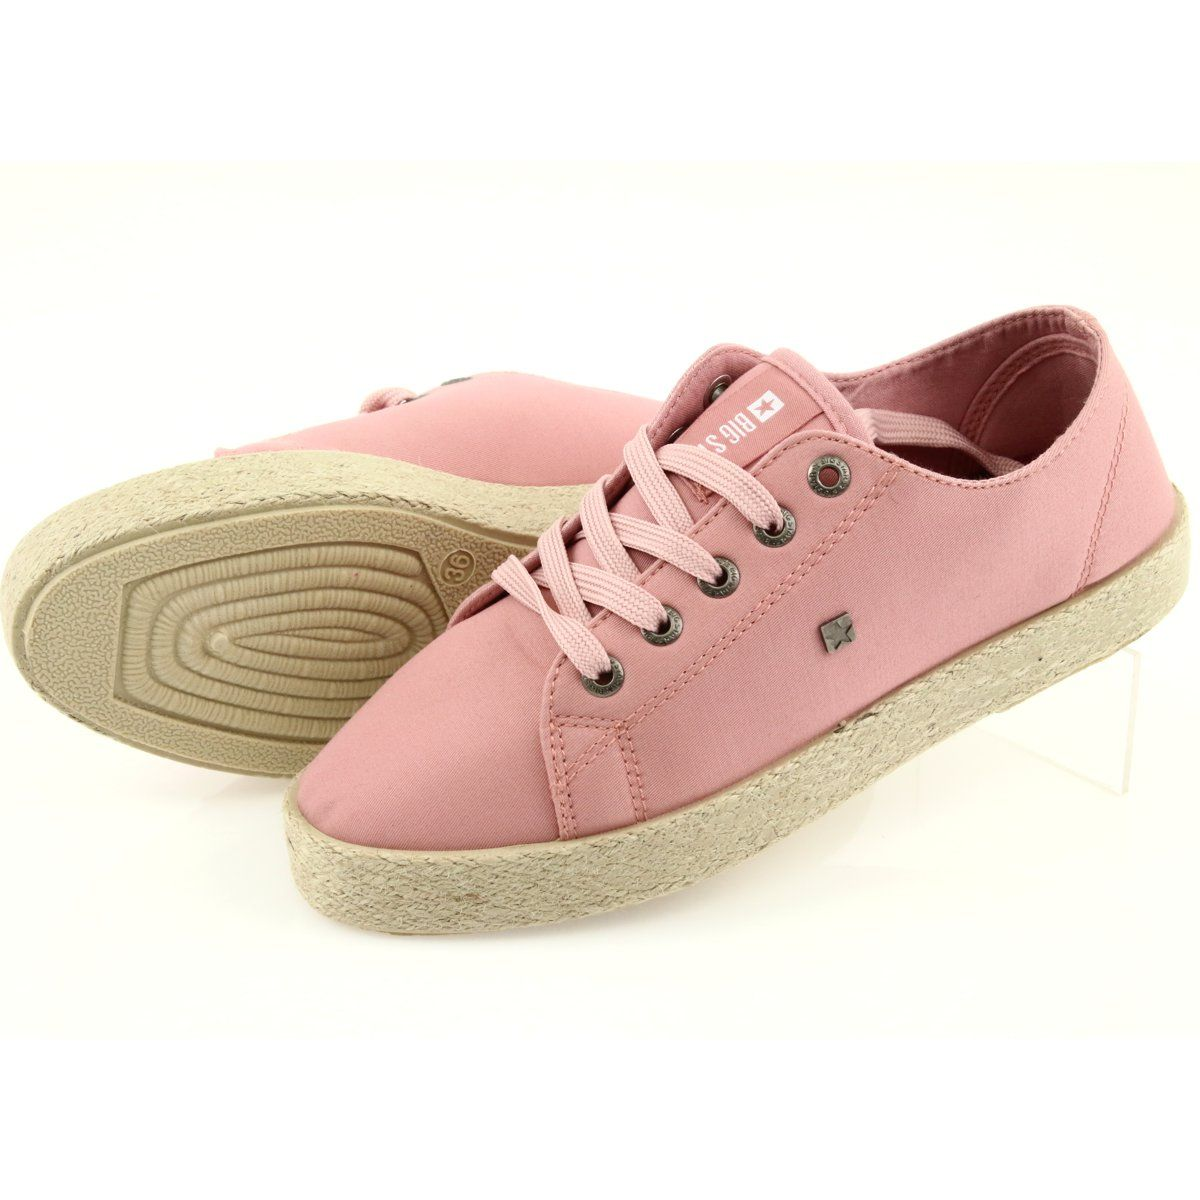 Balerinki Espadryle Buty Damskie Rozowe Big Star 274425 Ballerina Espadrilles Women Shoes Espadrilles